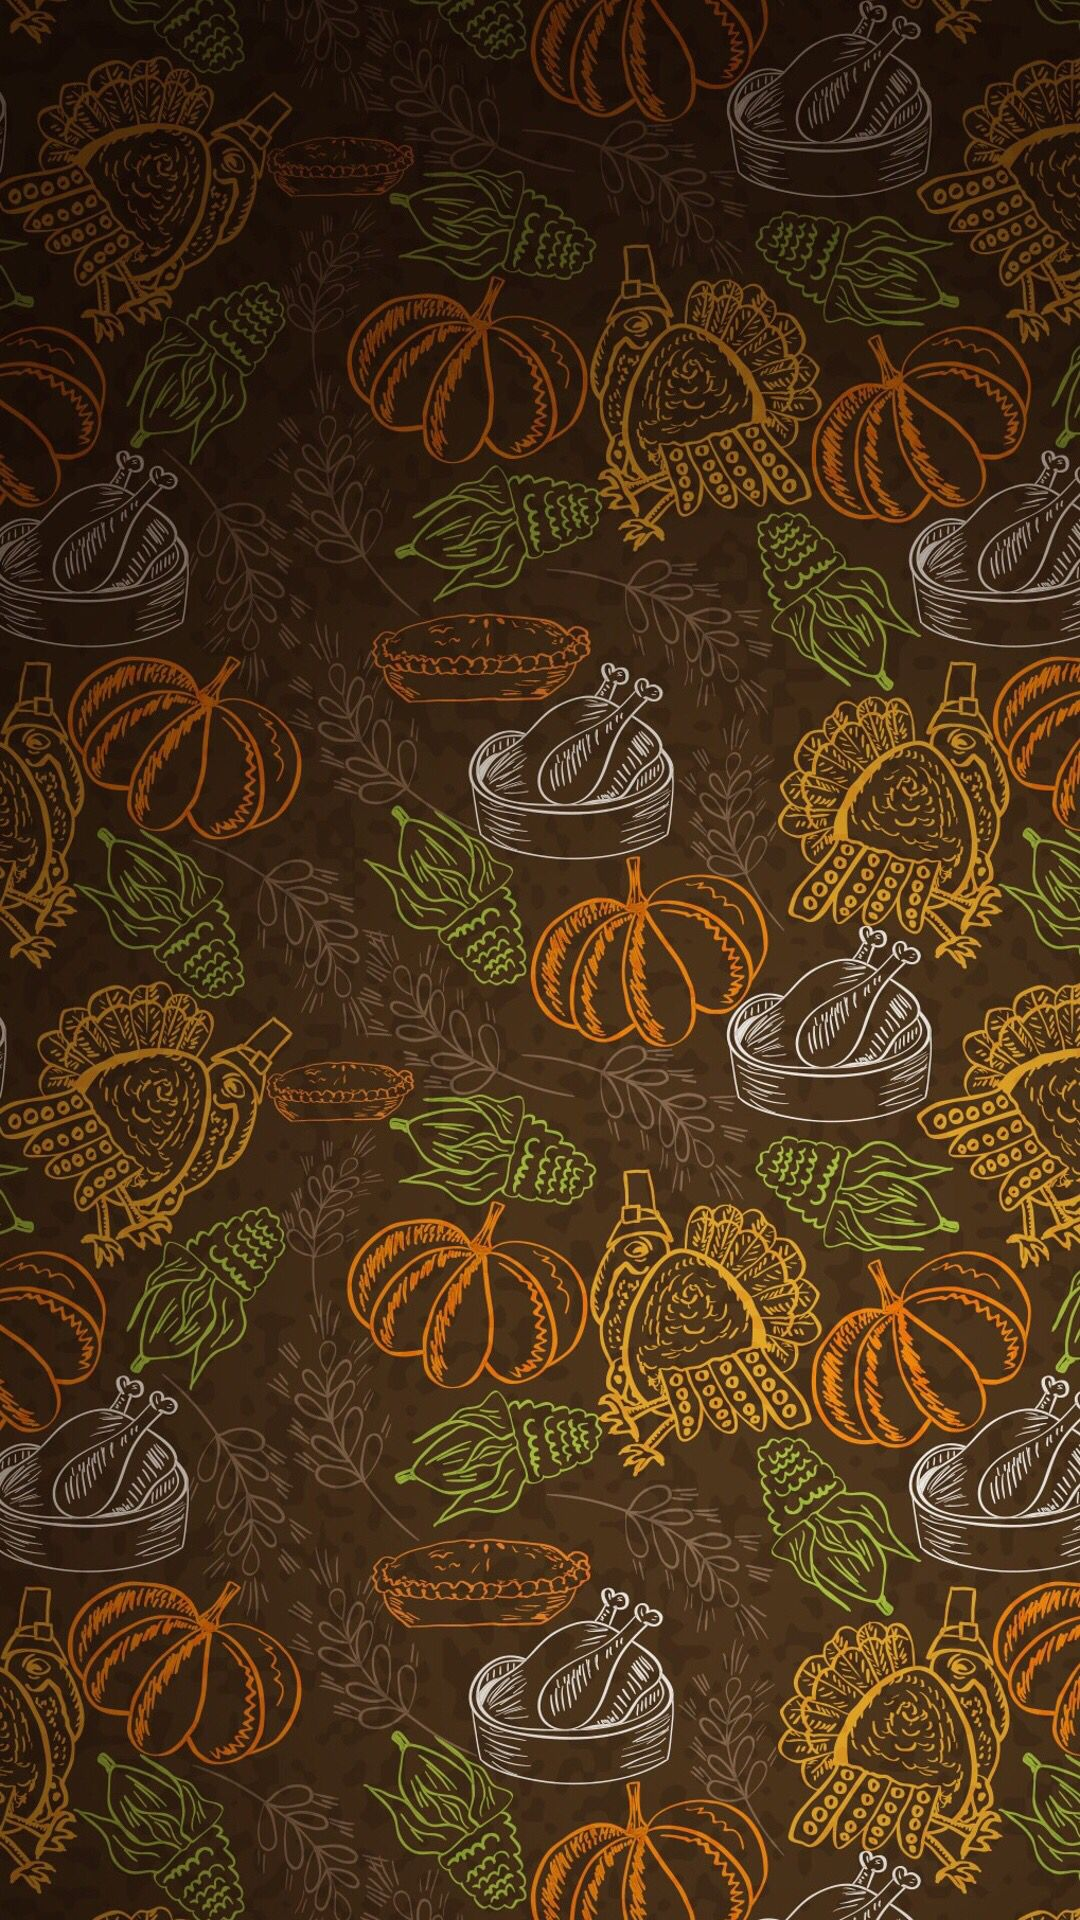 Thanksgiving Wallpaper Zedge Thanksgiving Background Thanksgiving Wallpaper Cellphone Wallpaper